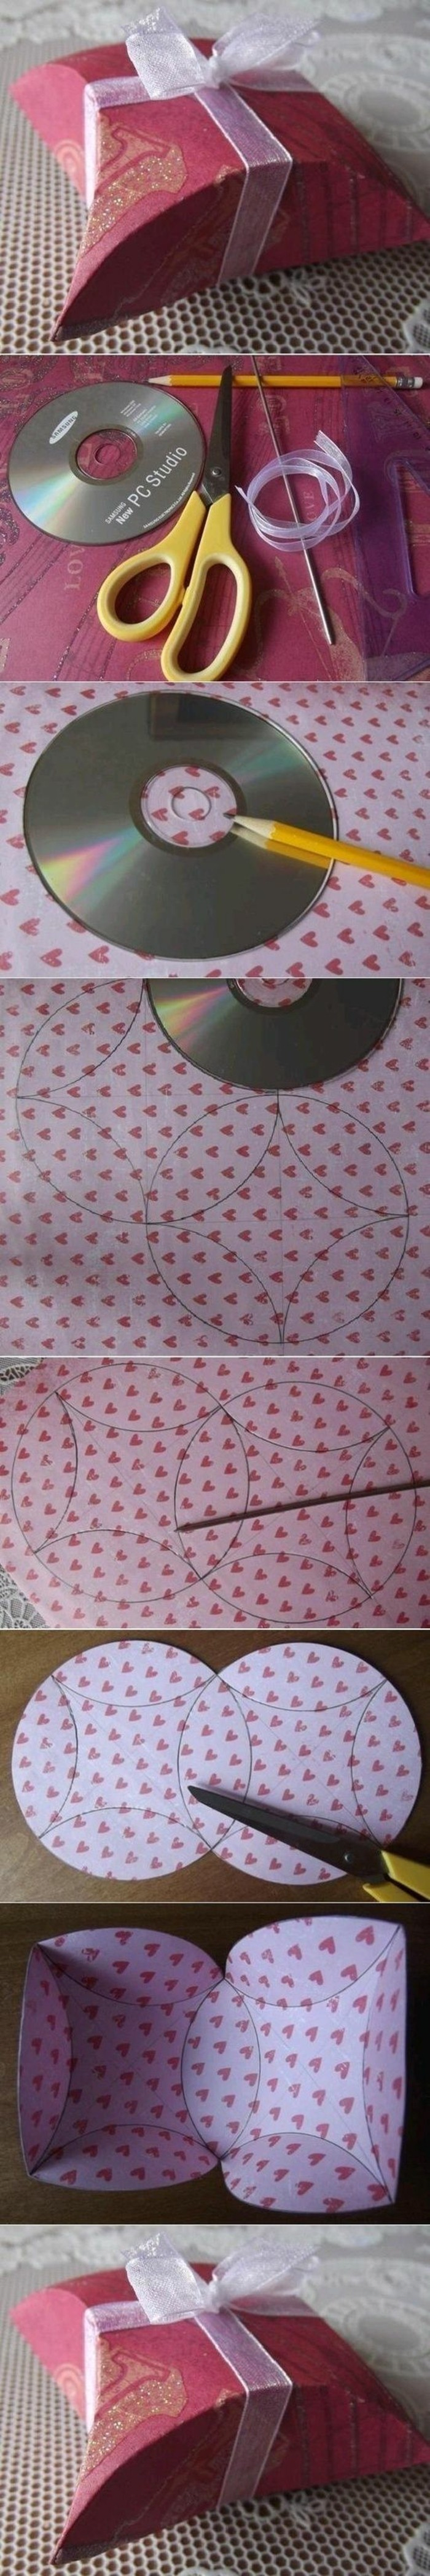 kreative-geschenkideen-geburtstagsgeschenkideen-interessante-rosa-geschenkverpackung